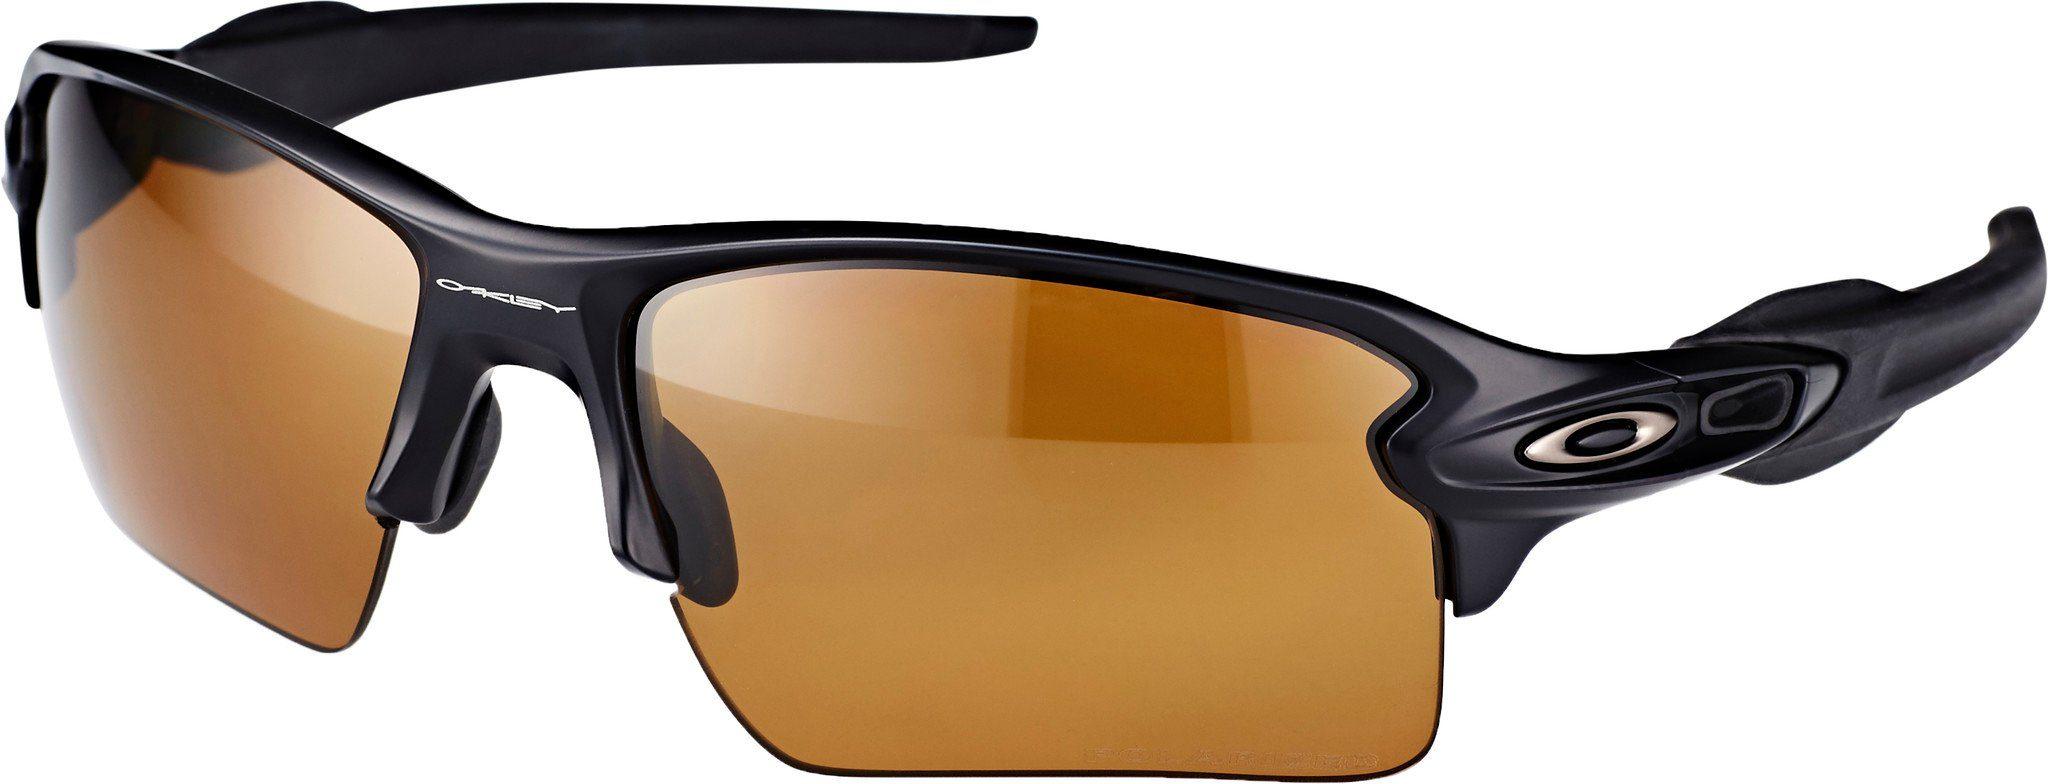 Oakley Radsportbrille »Polarized Flak 2.0 XL Brille«